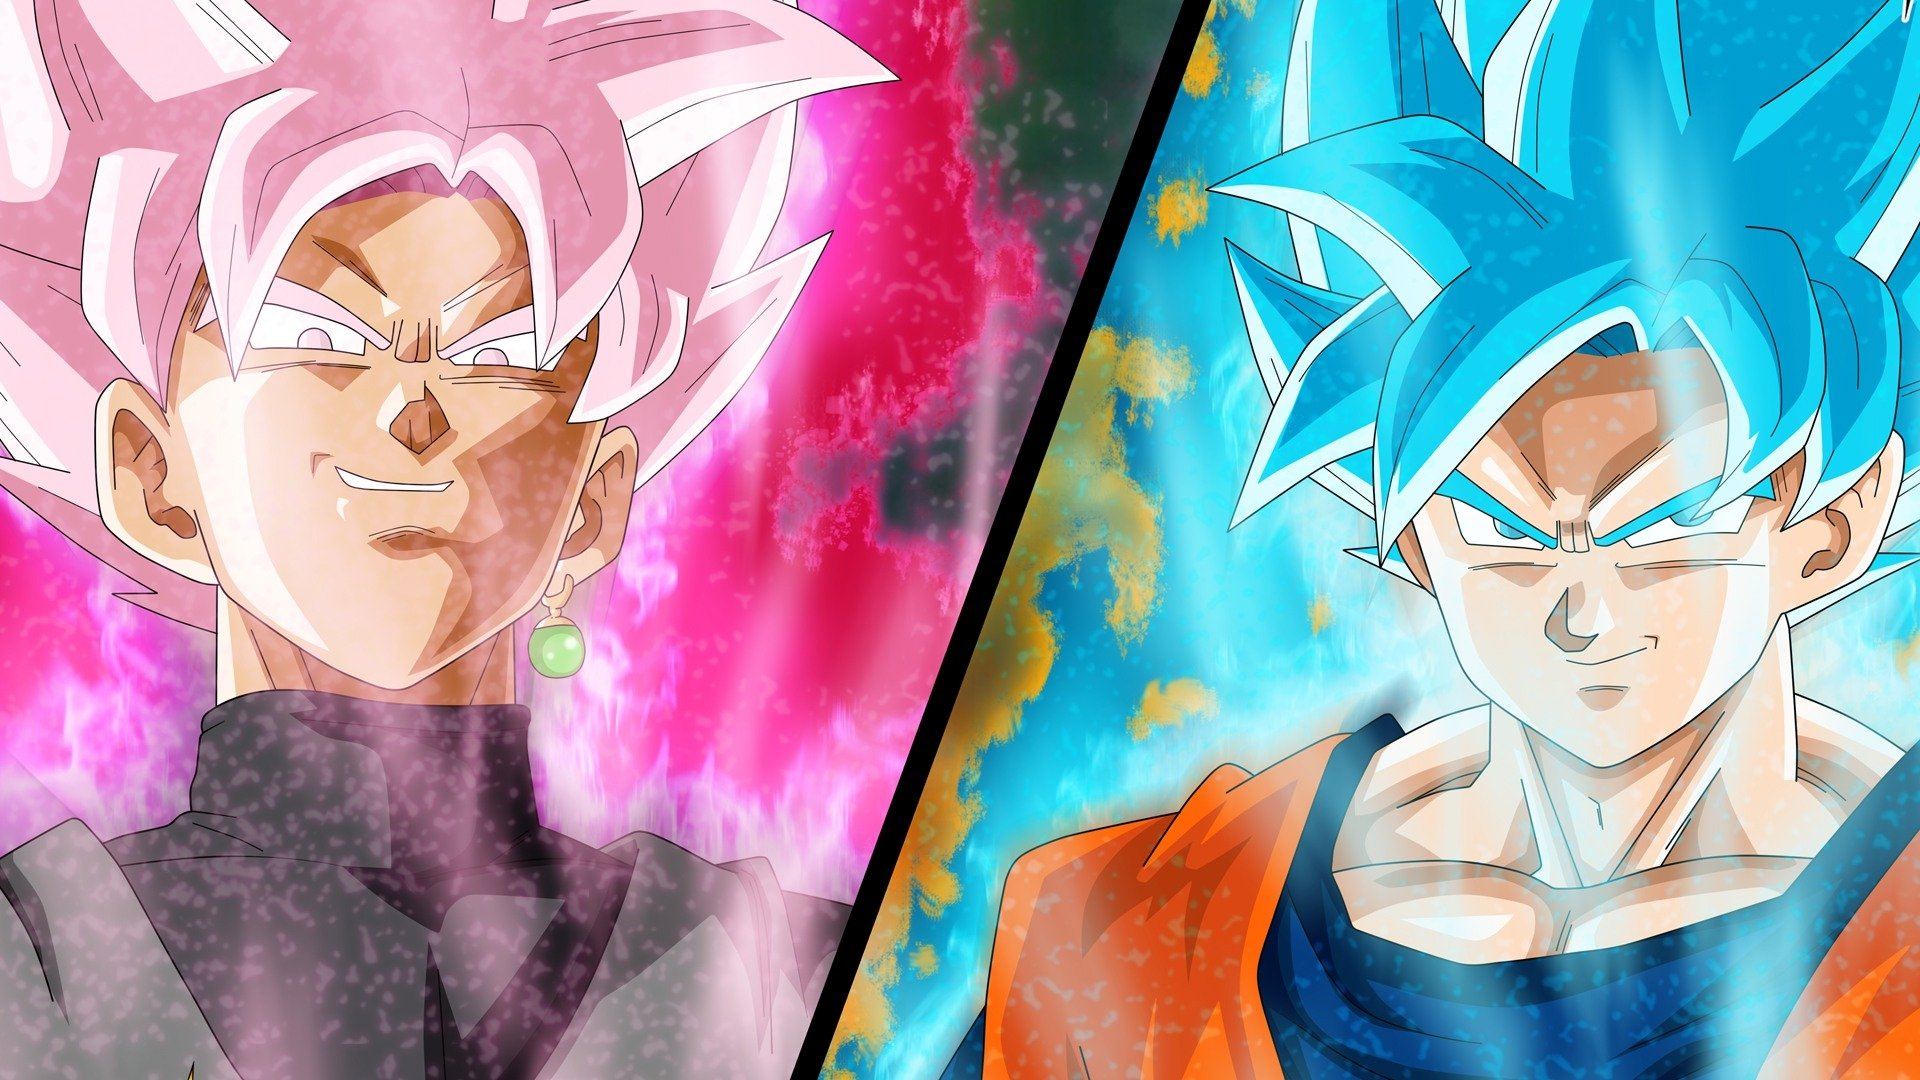 Black Goku Fondo De Pantalla And Fondo De Escritorio: Goku And Black Goku Fondo De Pantalla